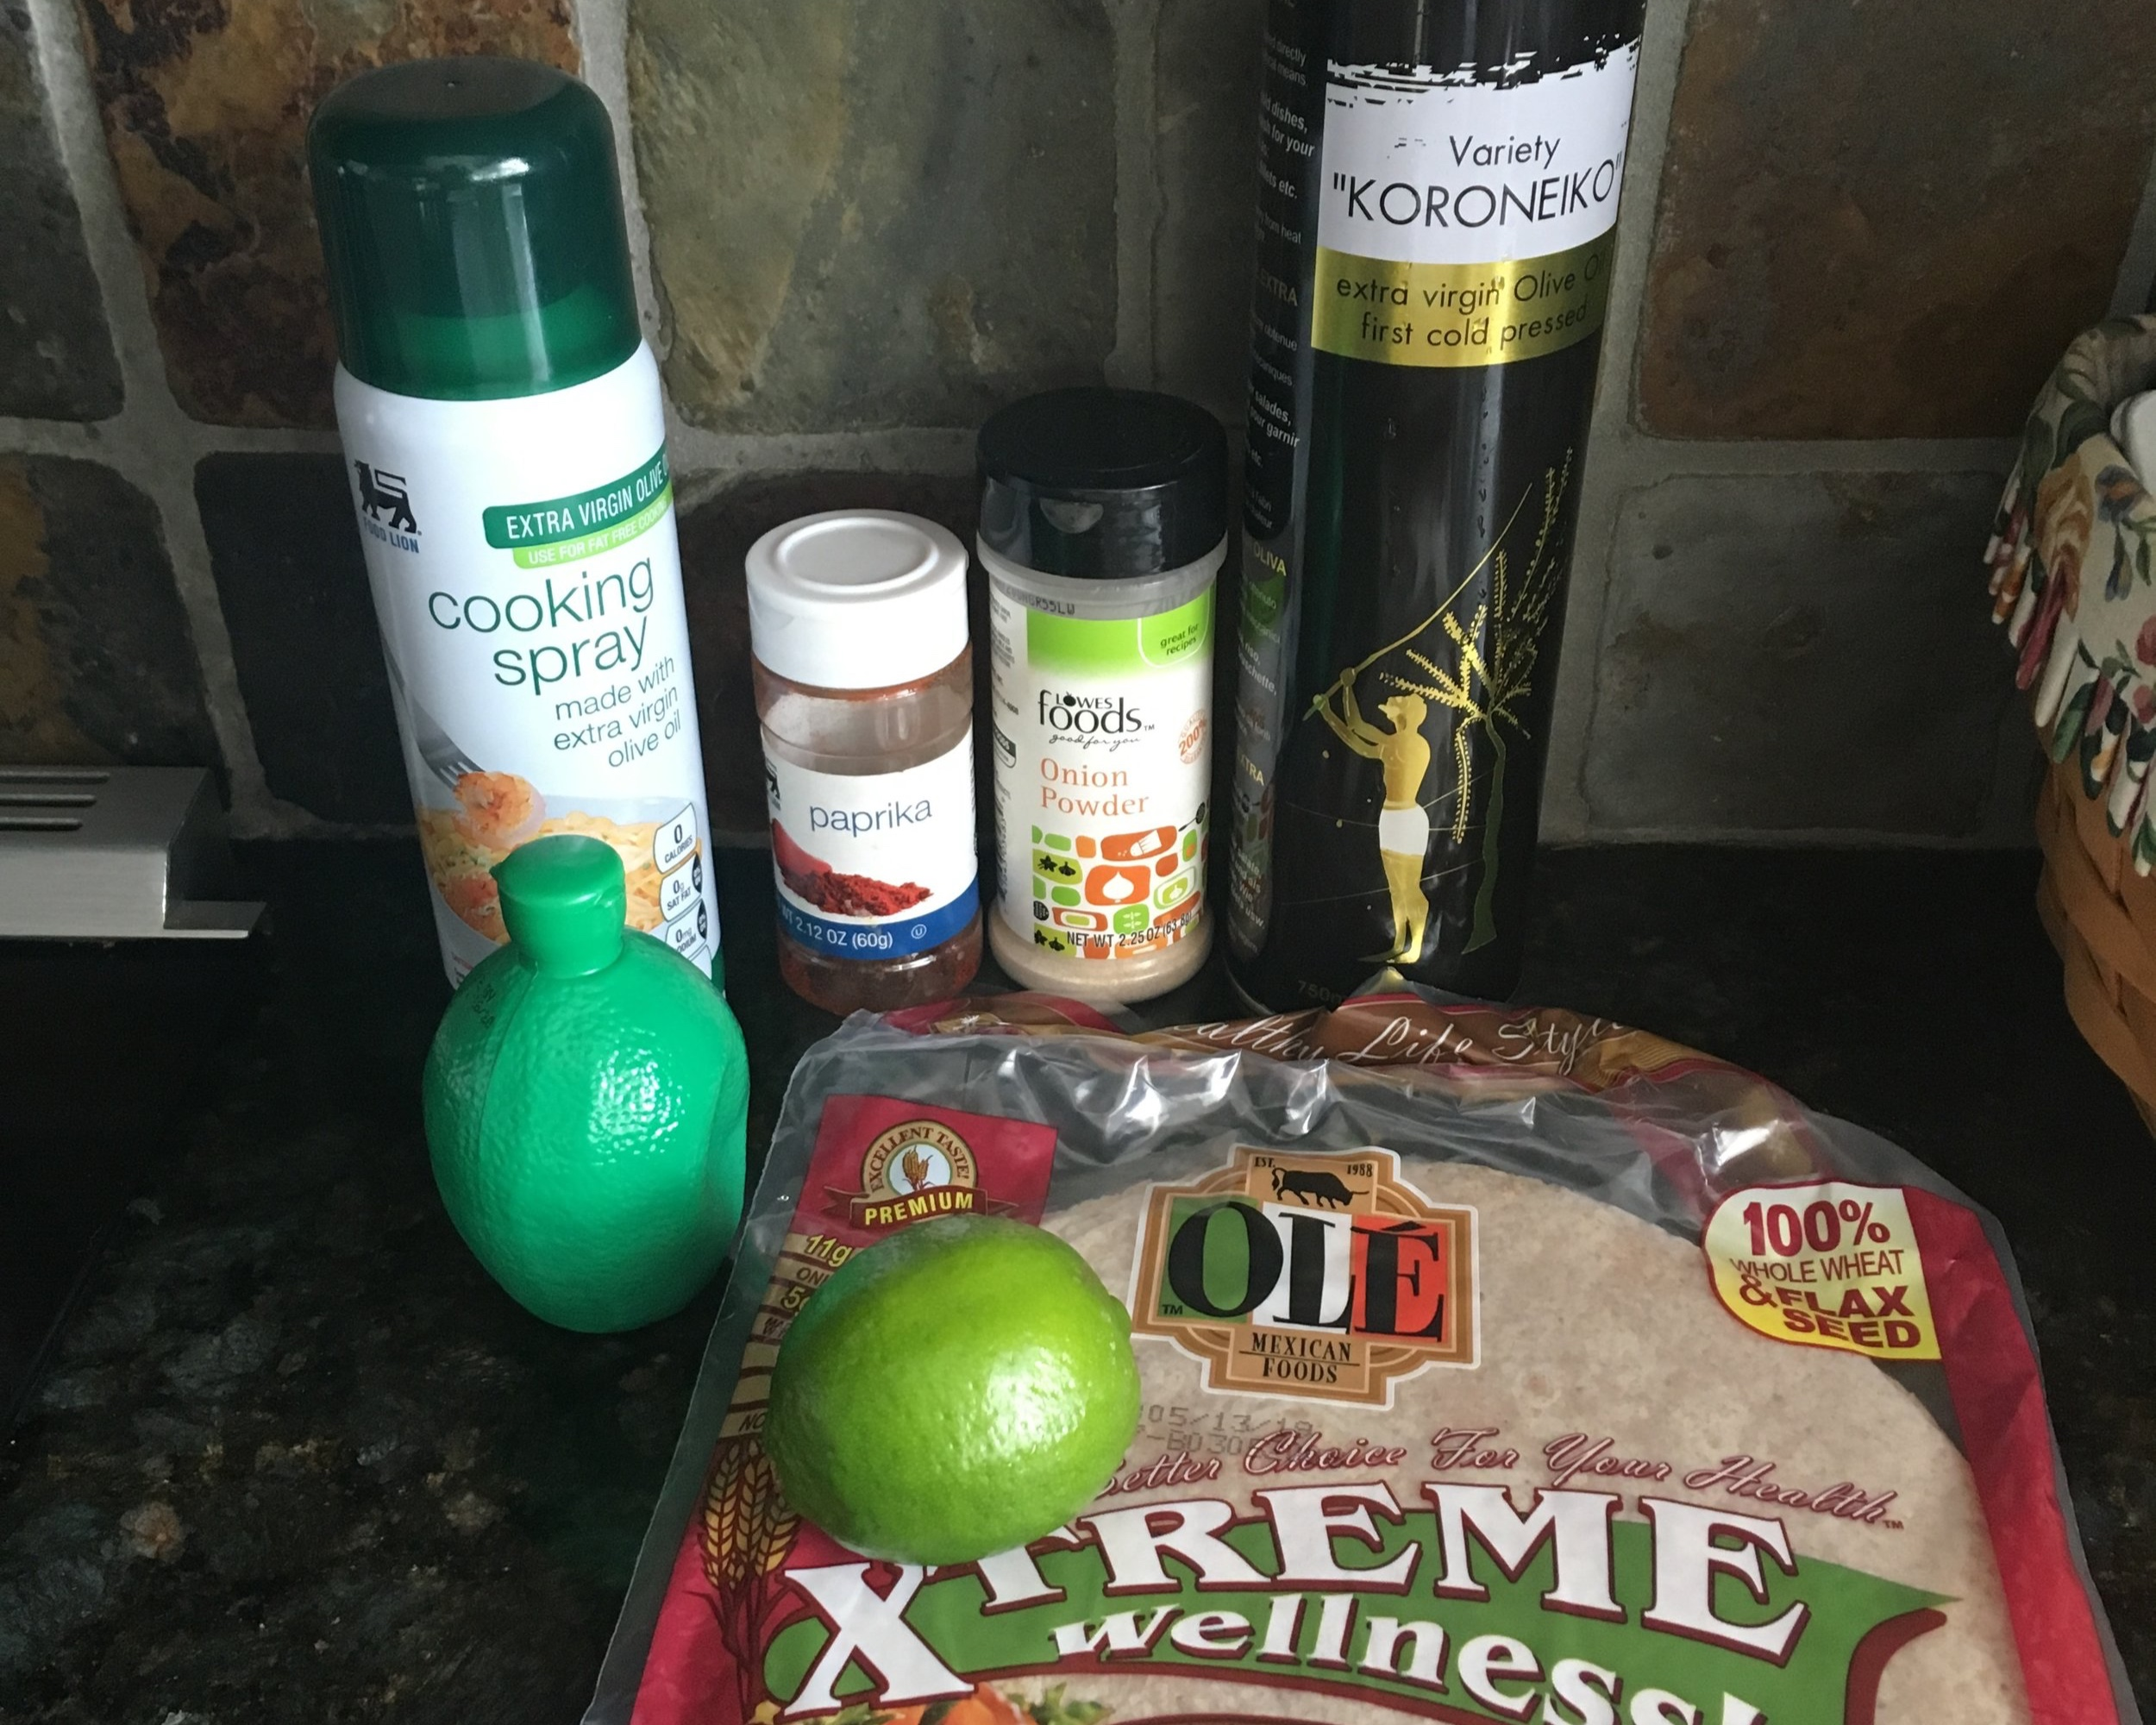 Ingredients - 1 Ole Tortilla1 TBS Olive OilCooking Spray1/4 Lime Skin ShavingsLime JuiceOnion PowderPaprikaSea Salt